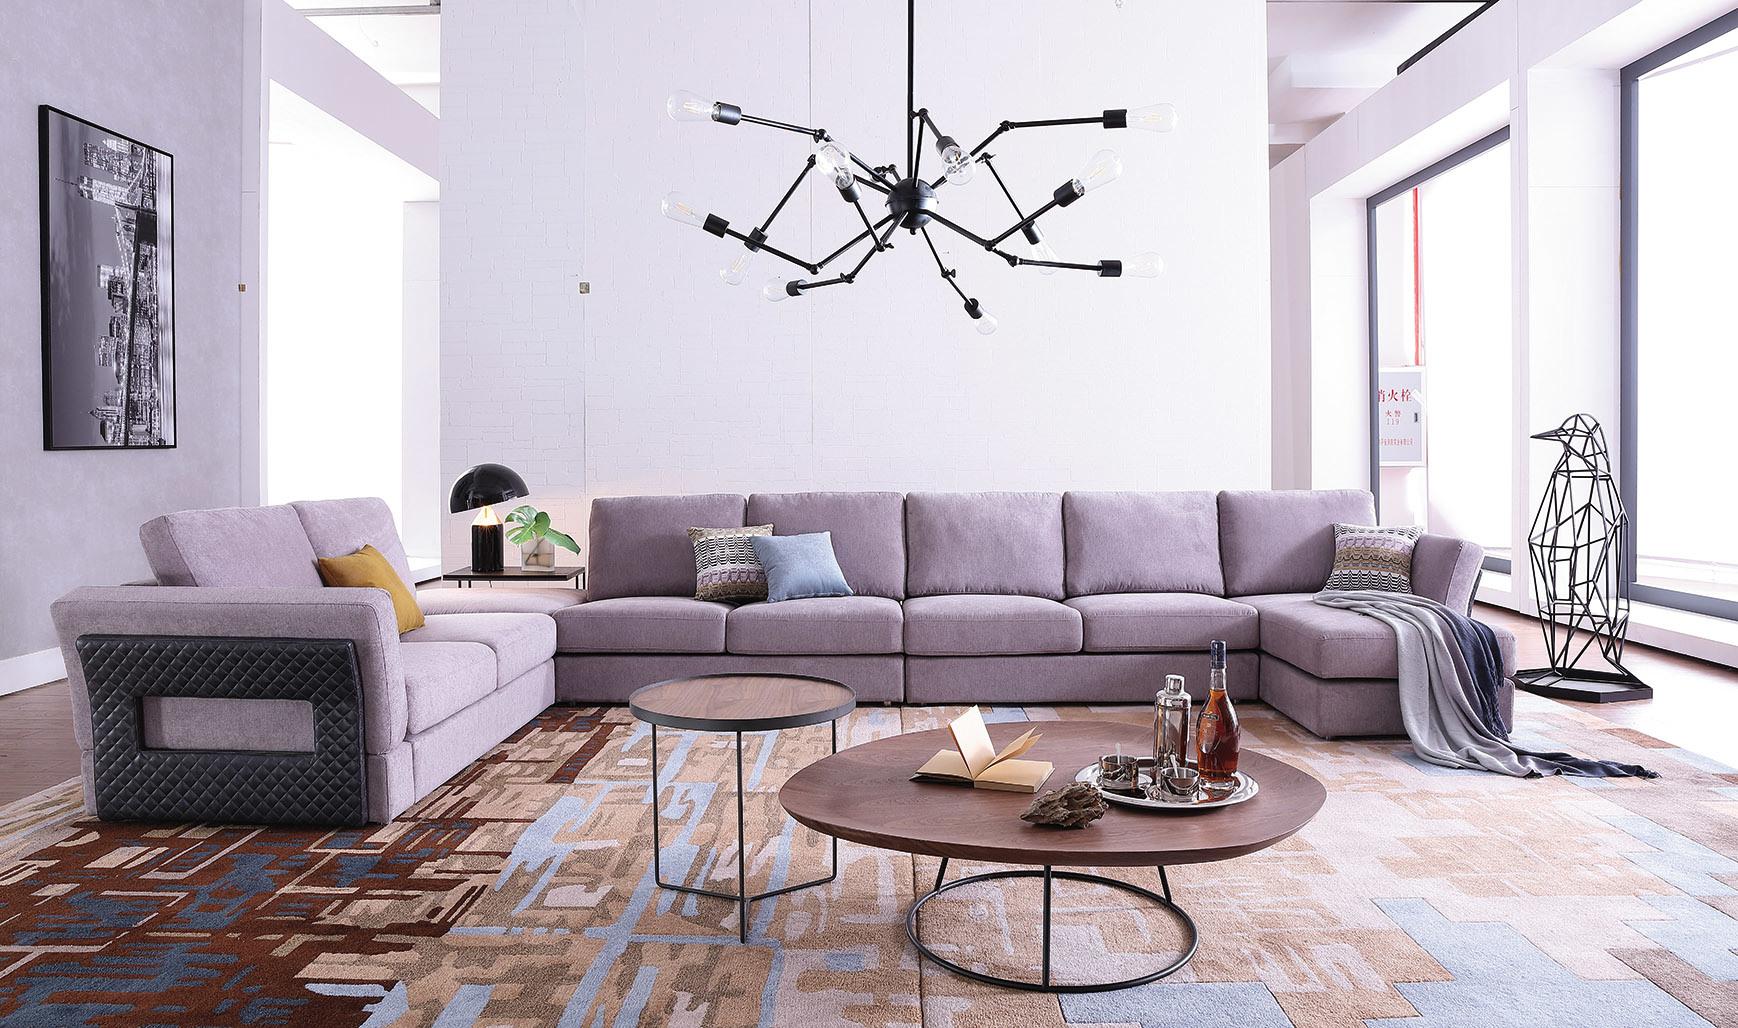 [Hot Item] Home Furniture Big Sectional Sofa Fabric Sofa Set with Ottoman